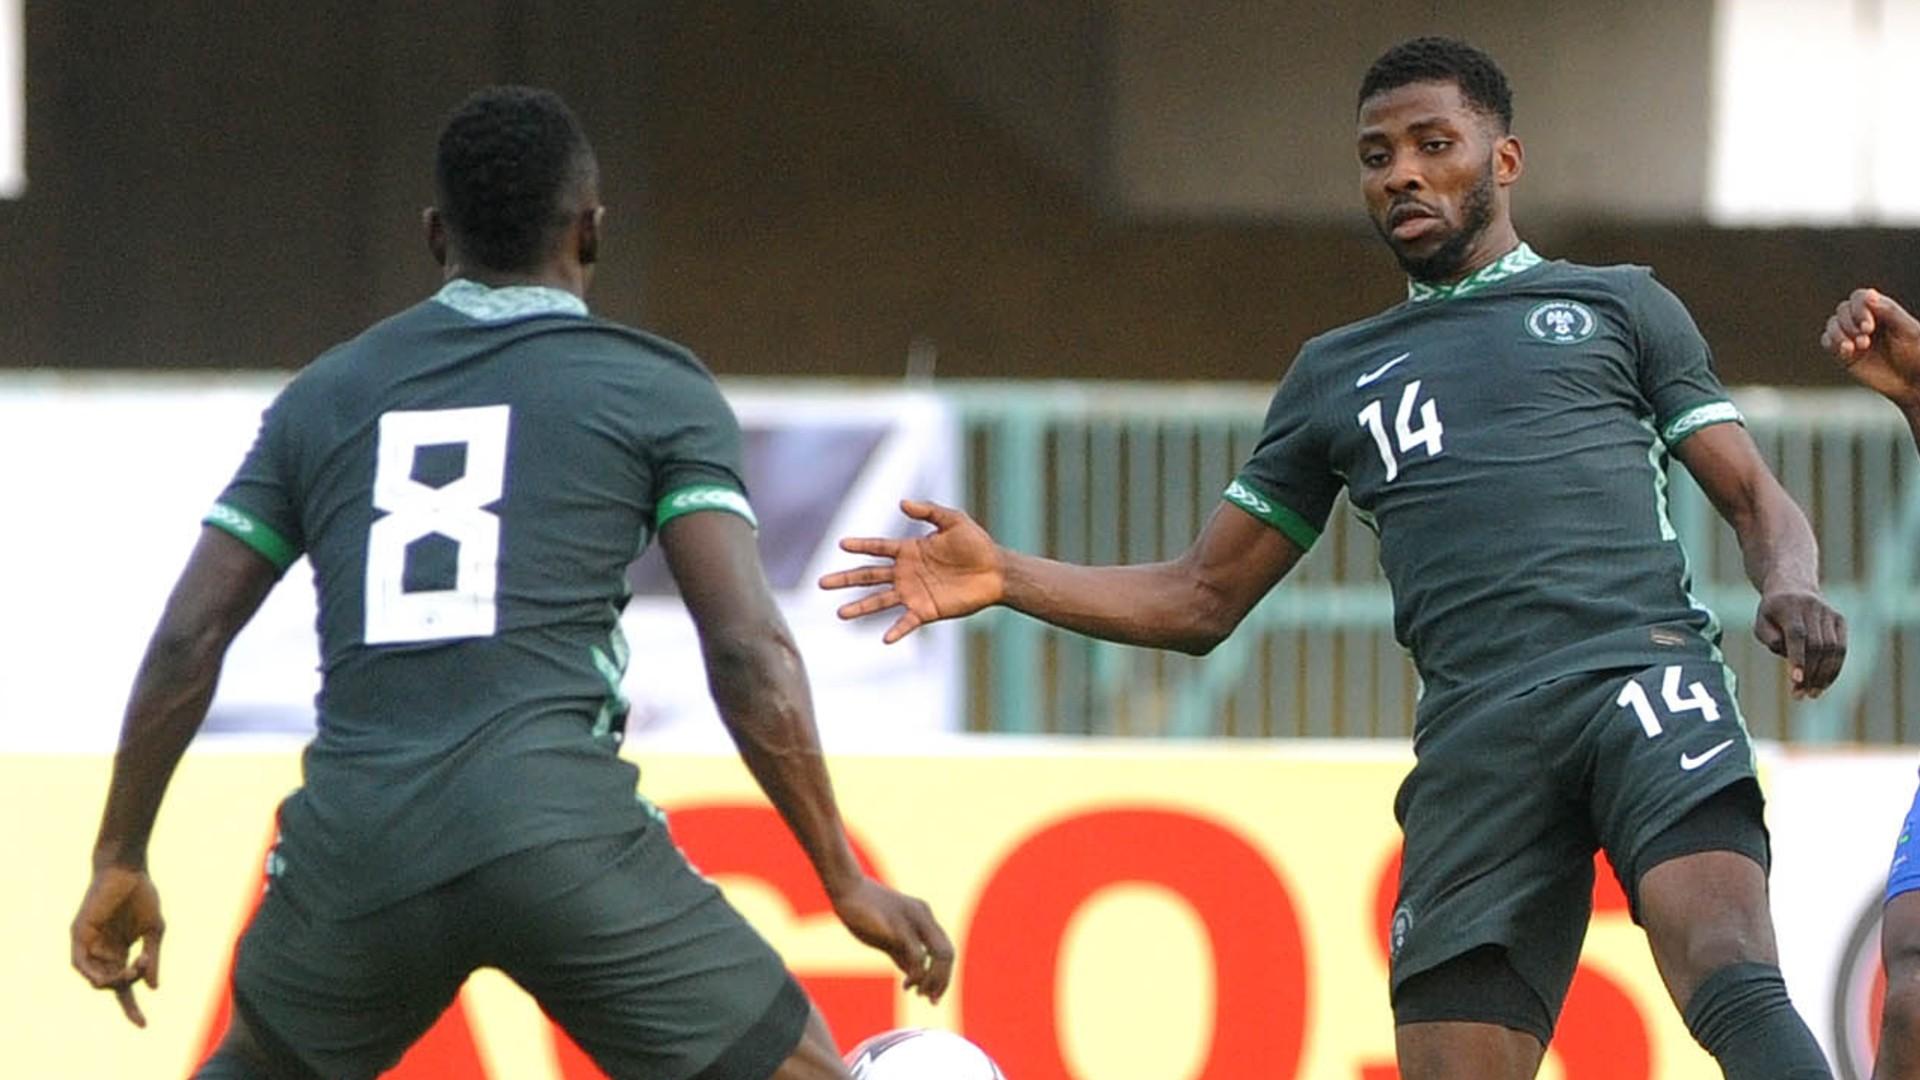 Nigeria vs Cameroon: Iheanacho & Onuachu lead Super Eagles attack